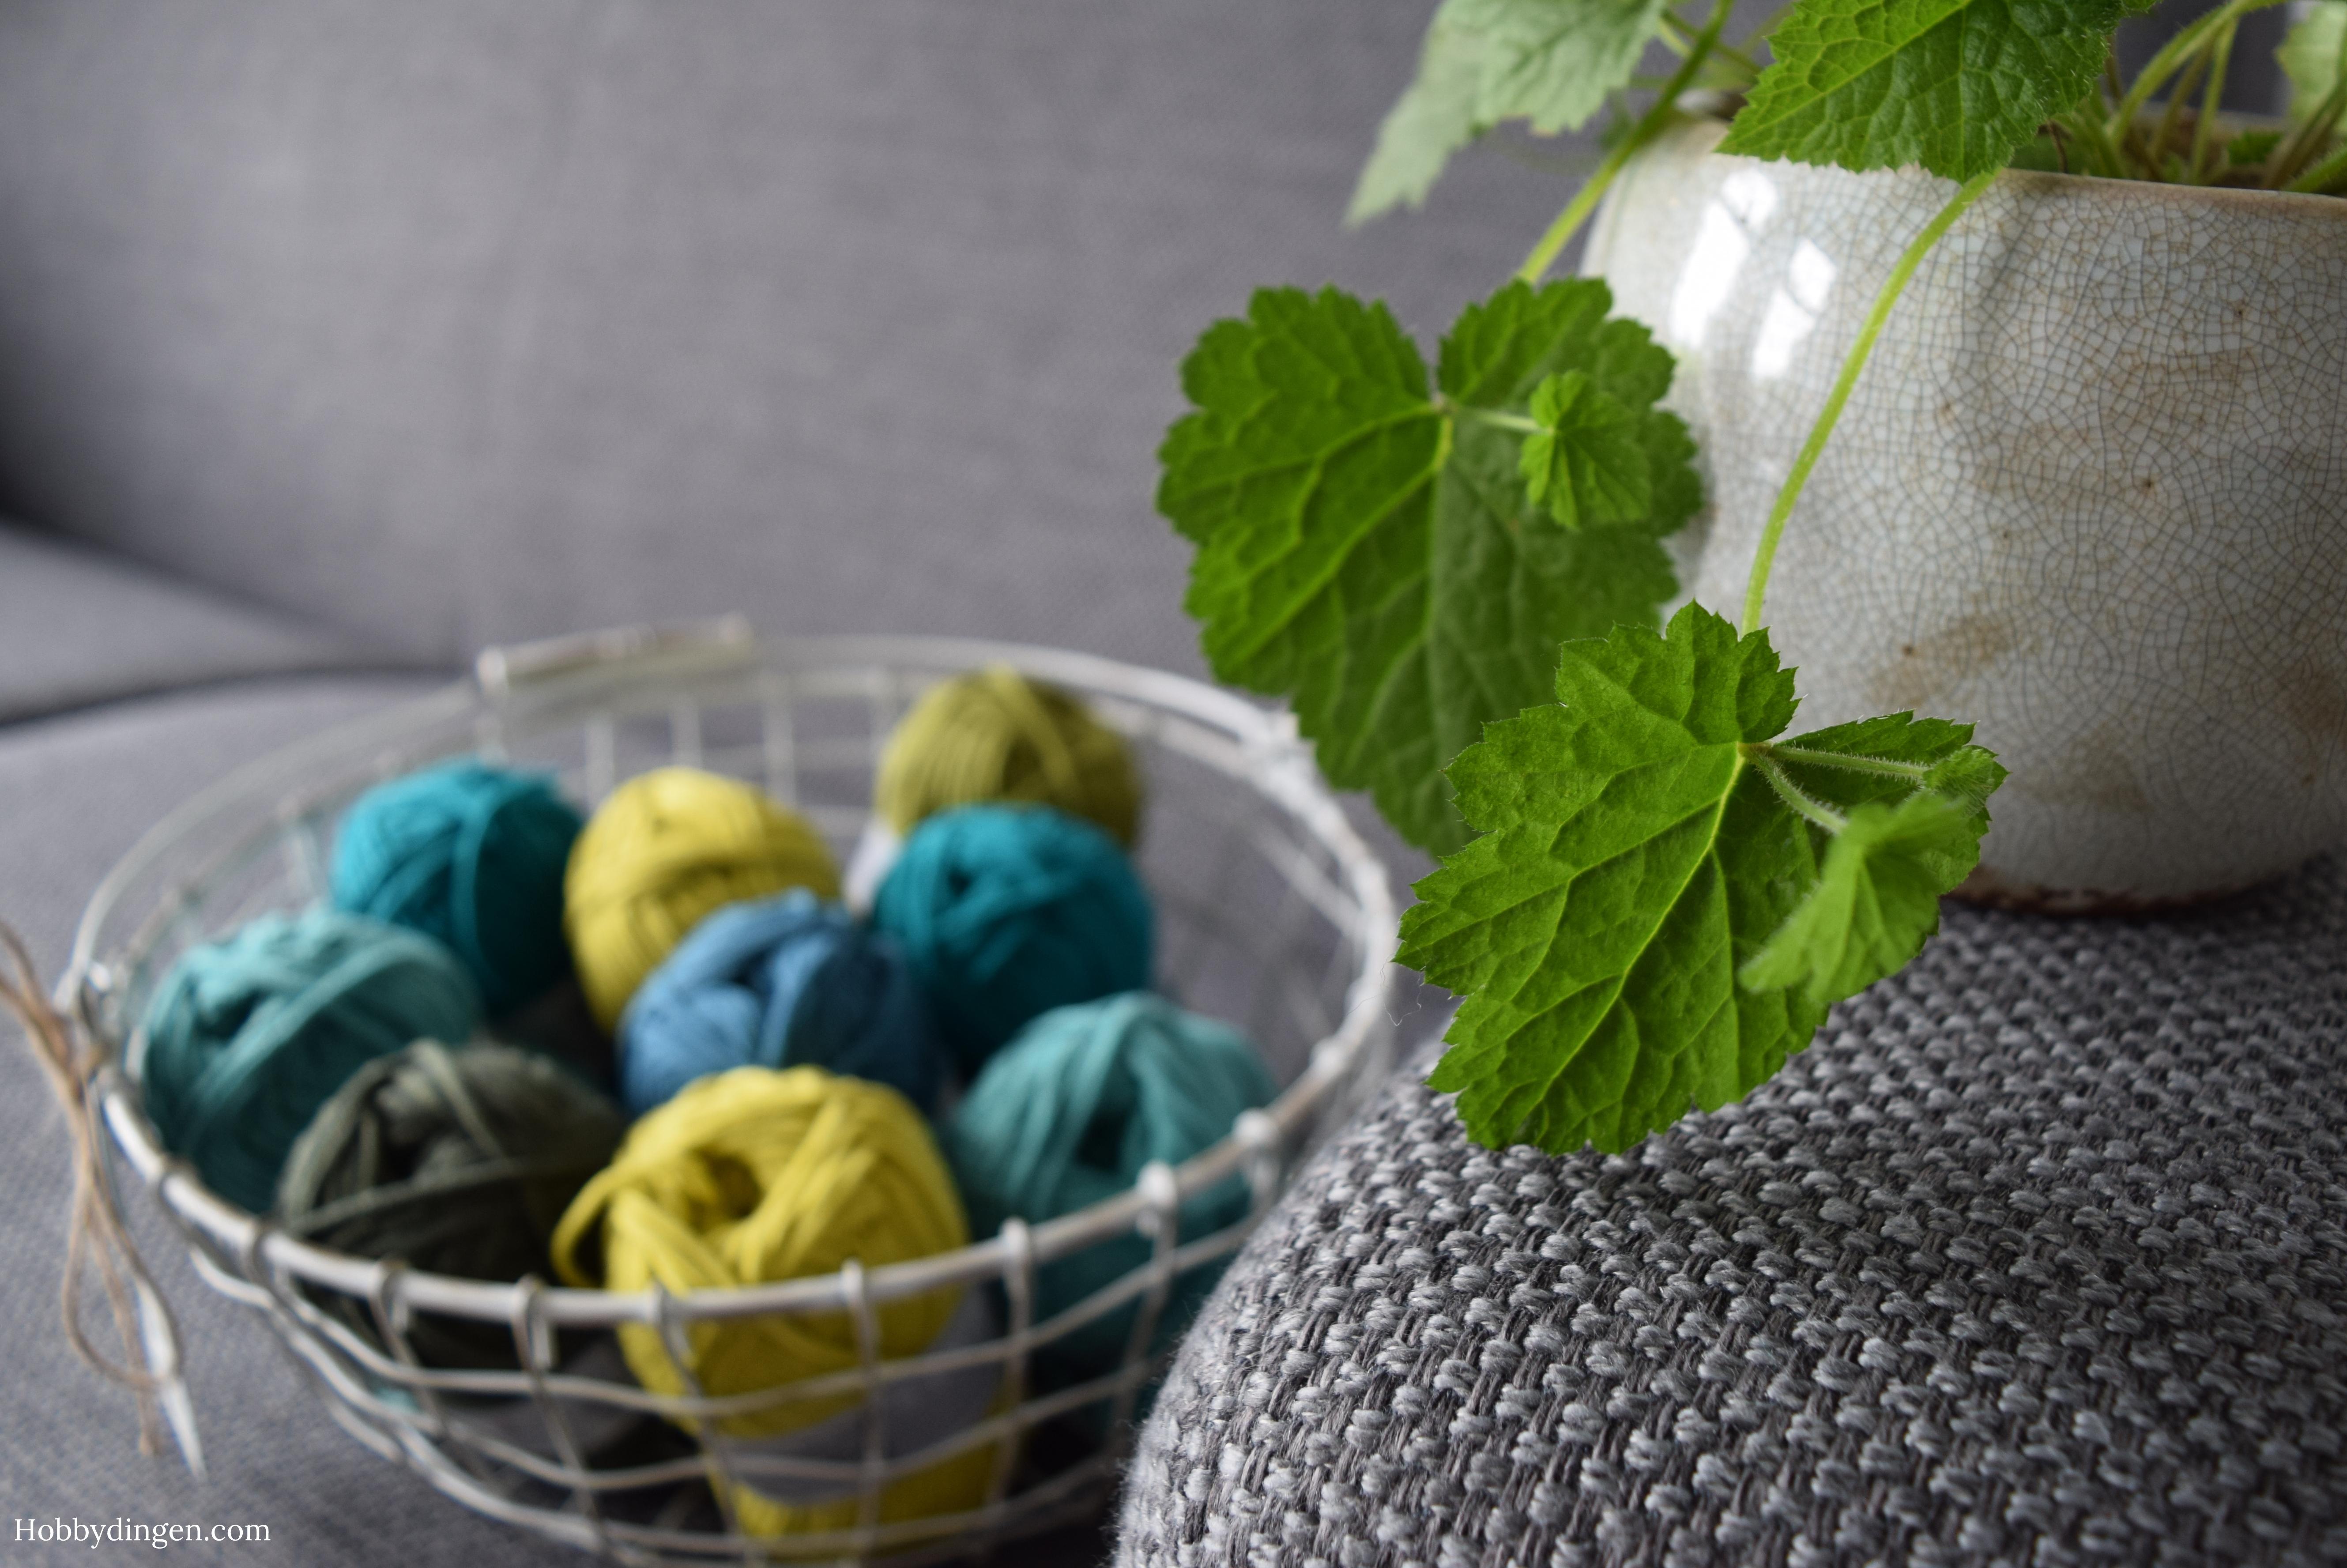 Hobbydingen.com - ByClaire 2 Tunisian Crochet Project